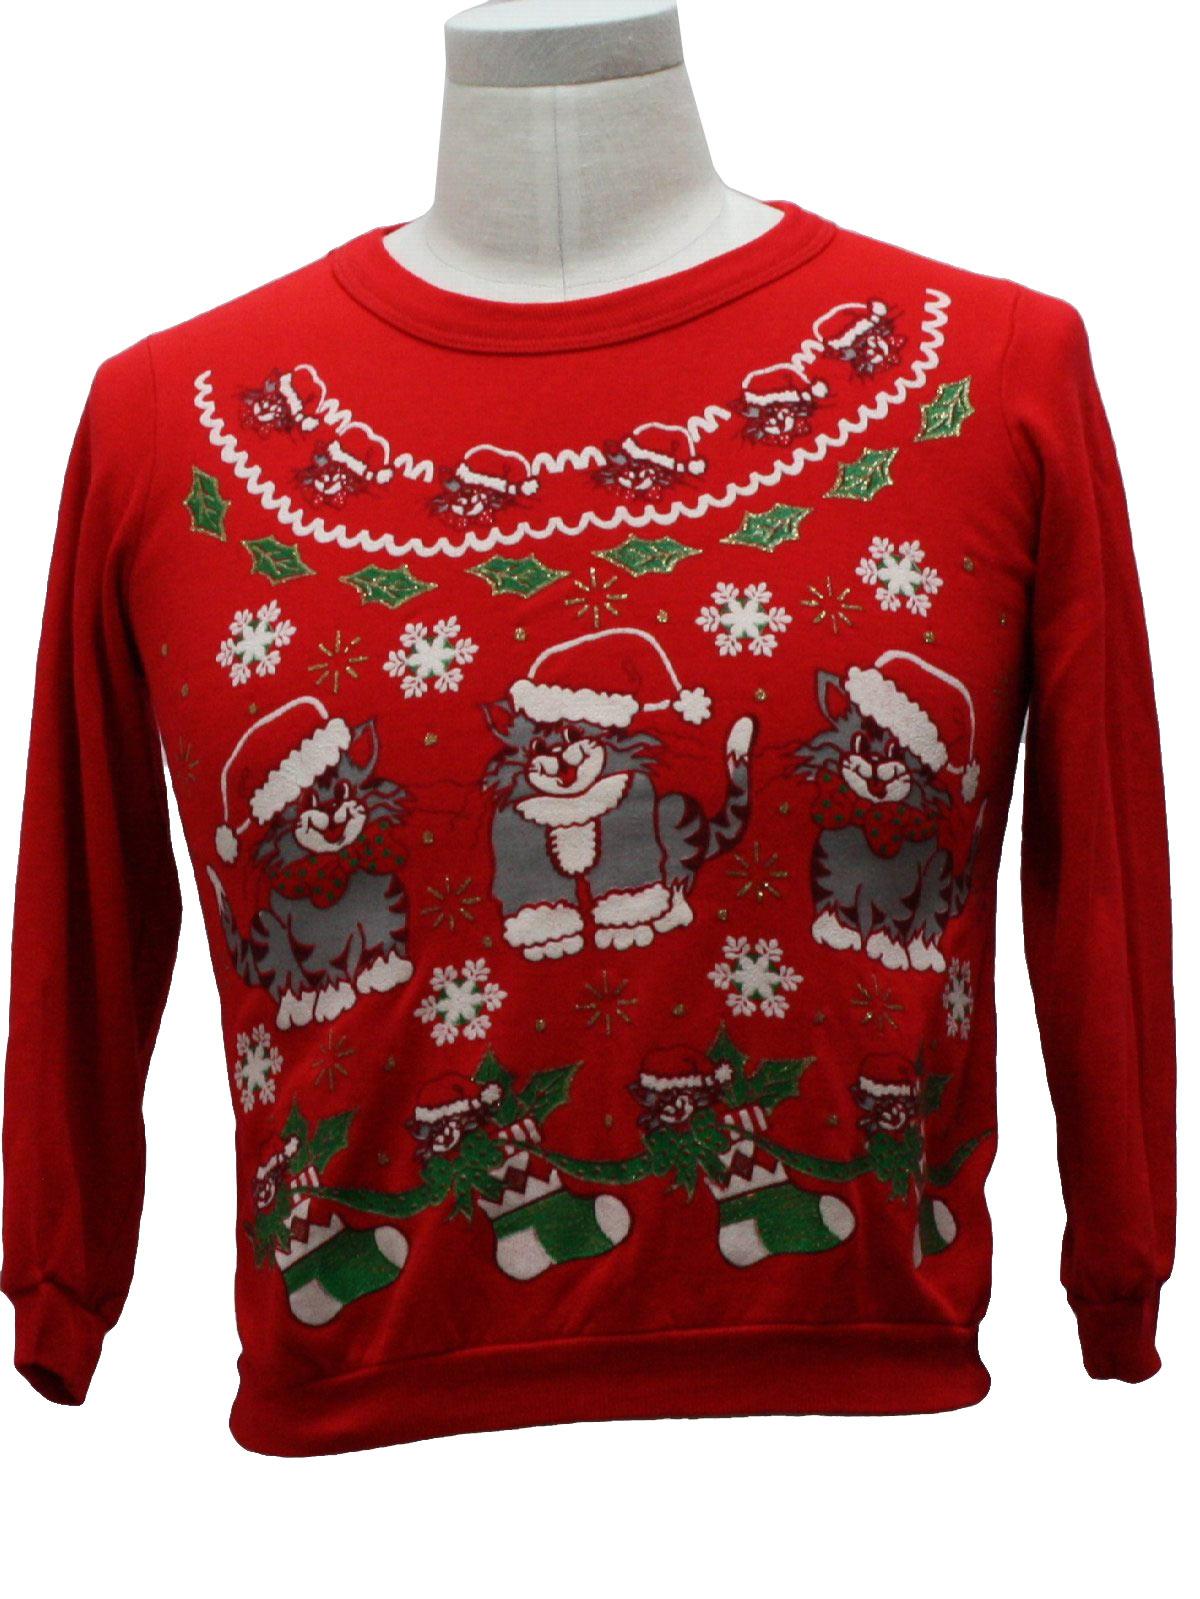 1980's Nutcracker Womens VintageCat-tastic Ugly Christmas Sweatshirt $32.00 Not in stock. Item No. 230105